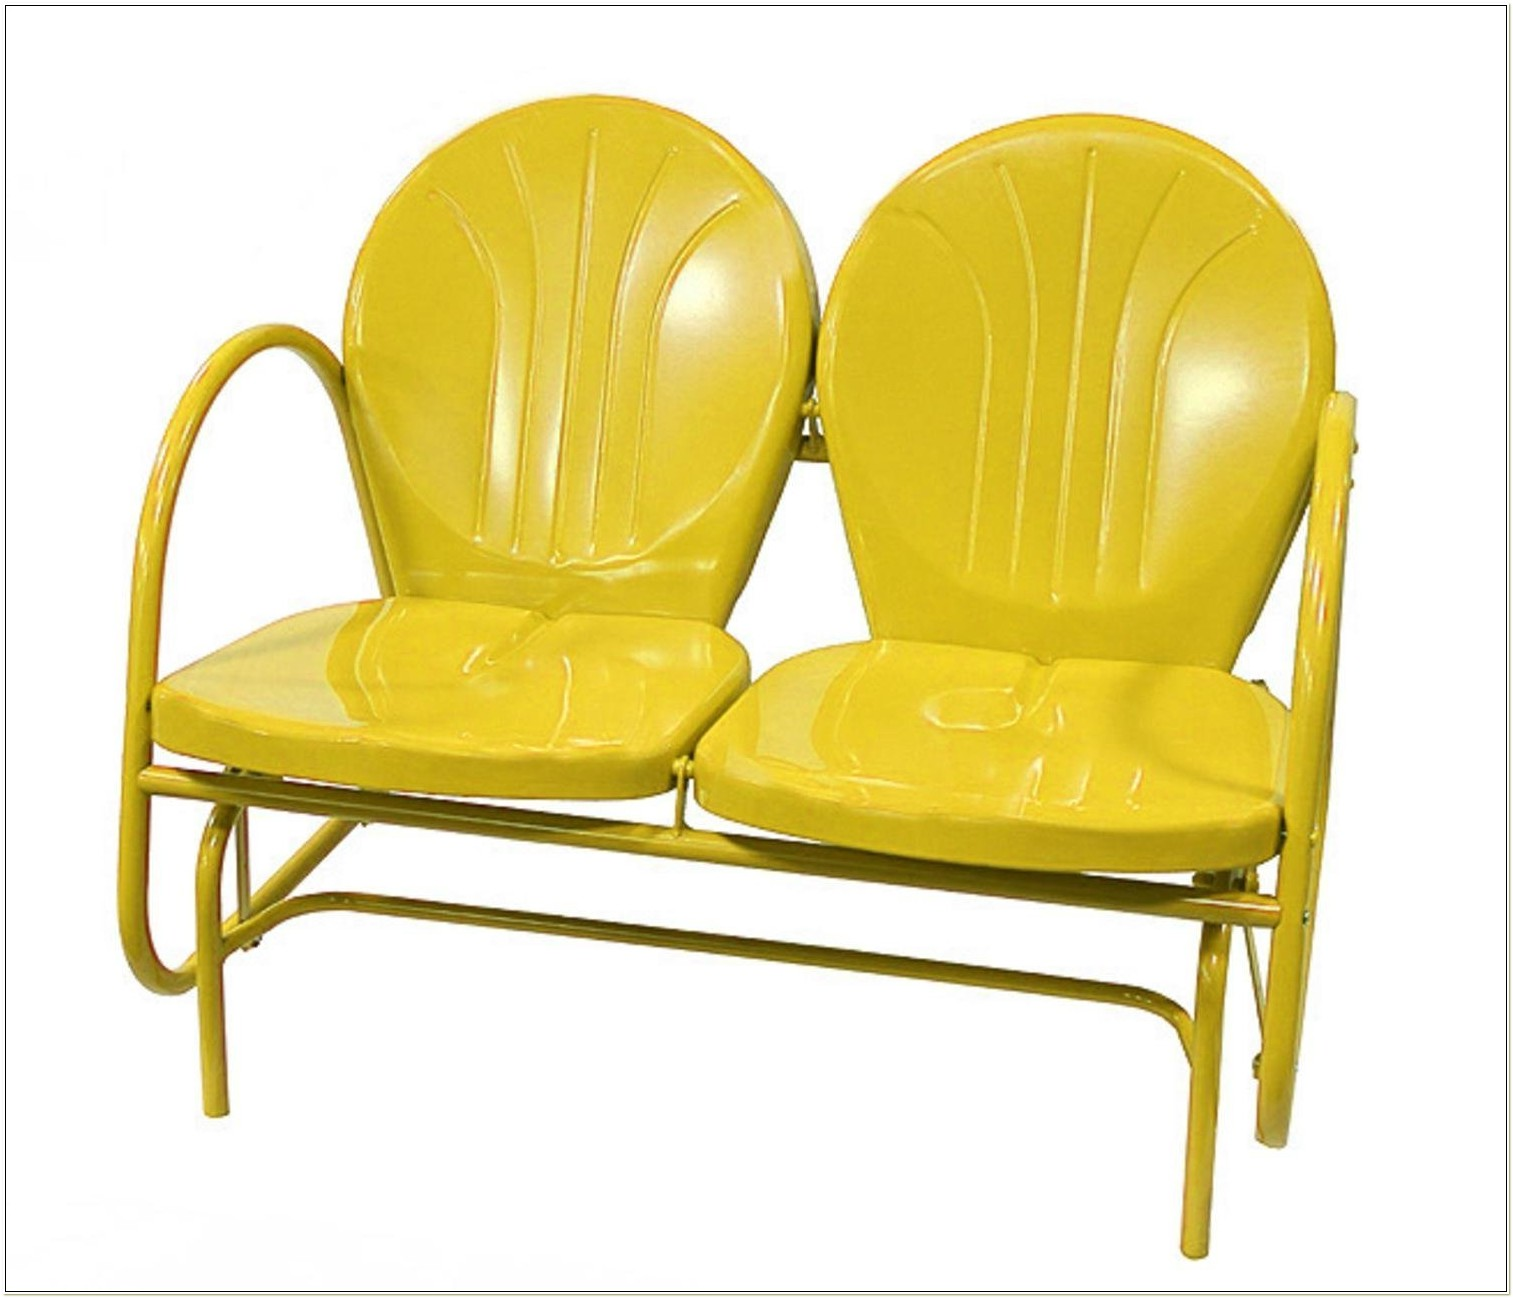 Yellow Retro Metal Tulip Chair